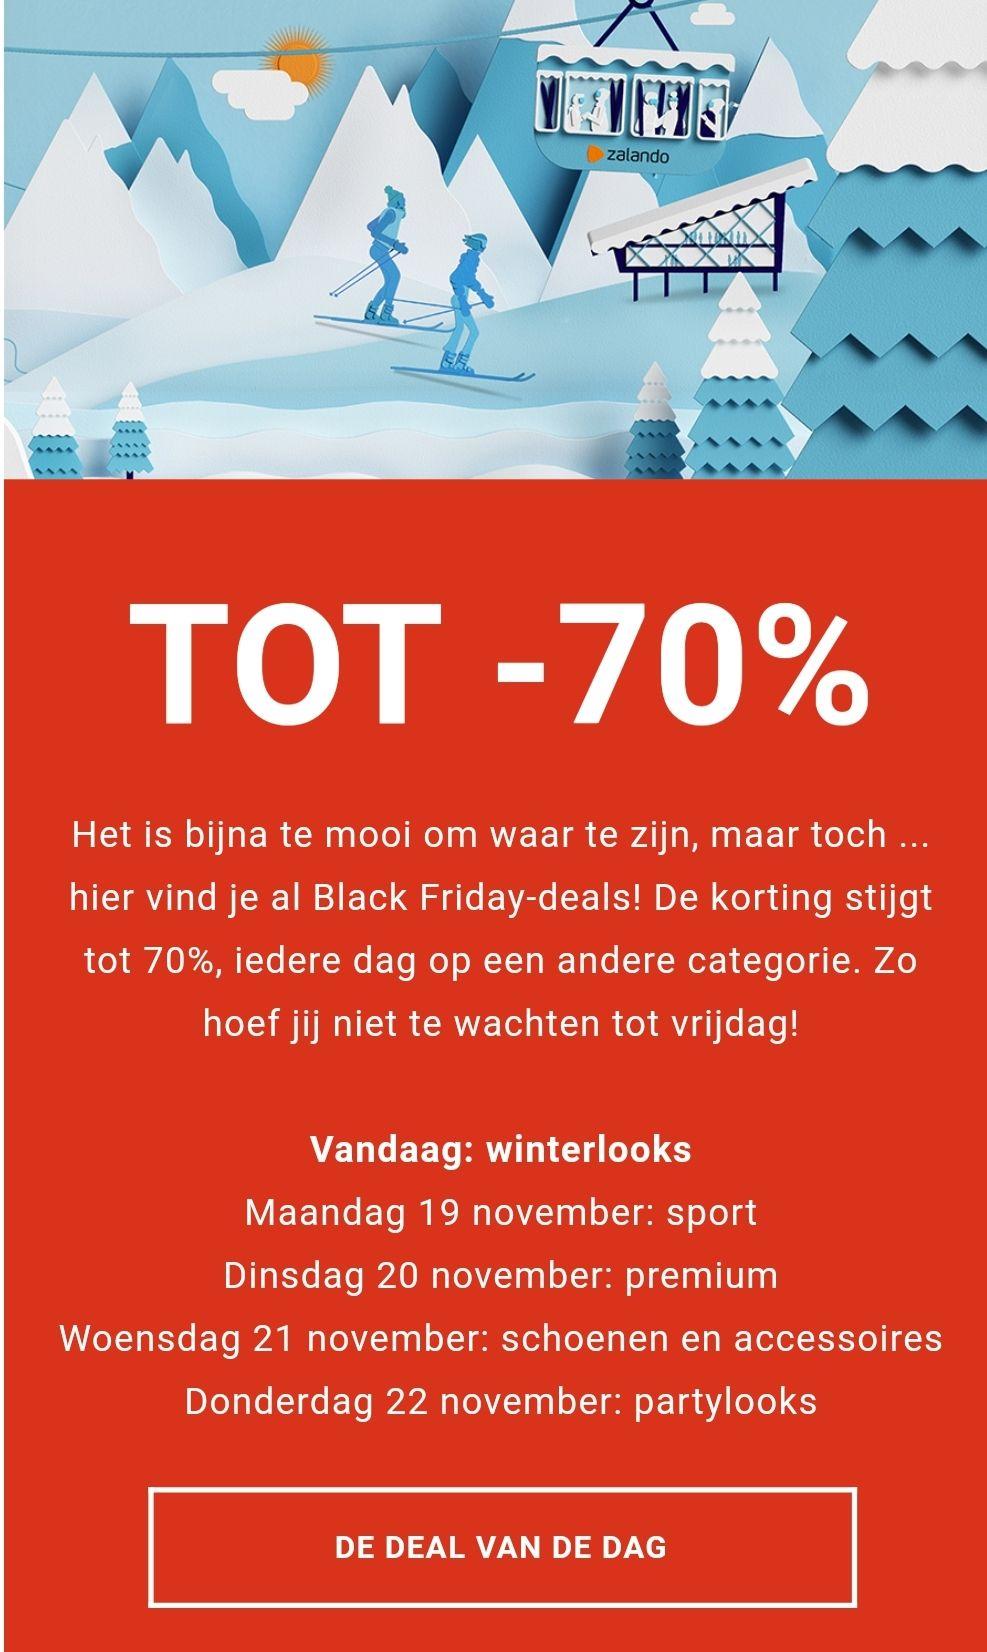 [Black Friday] Veel sale tot 70% korting @ Zalando